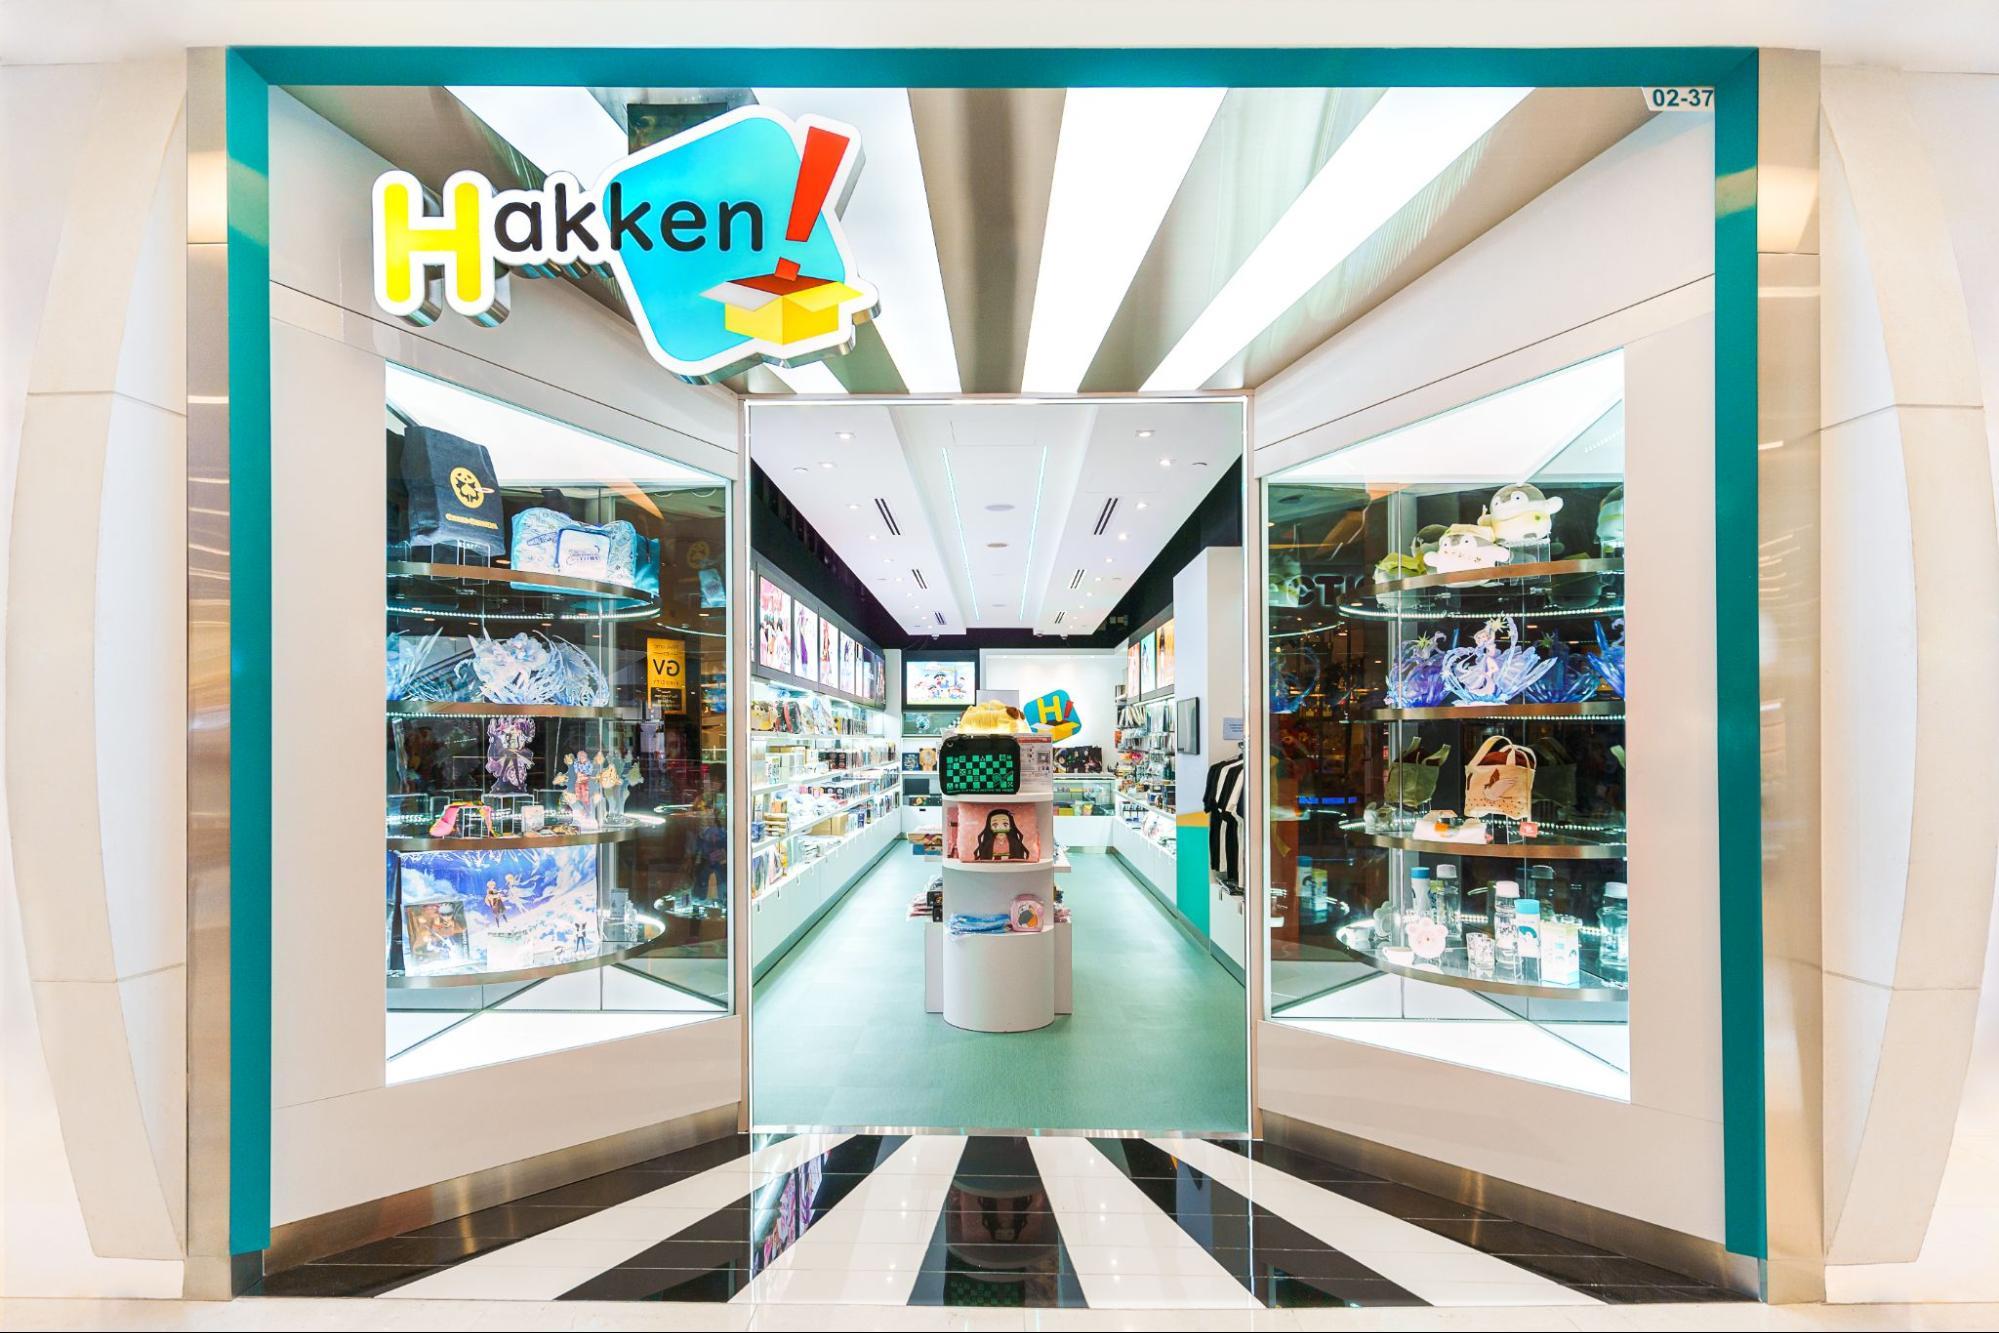 hakken vivocity - japanese anime shop singapore